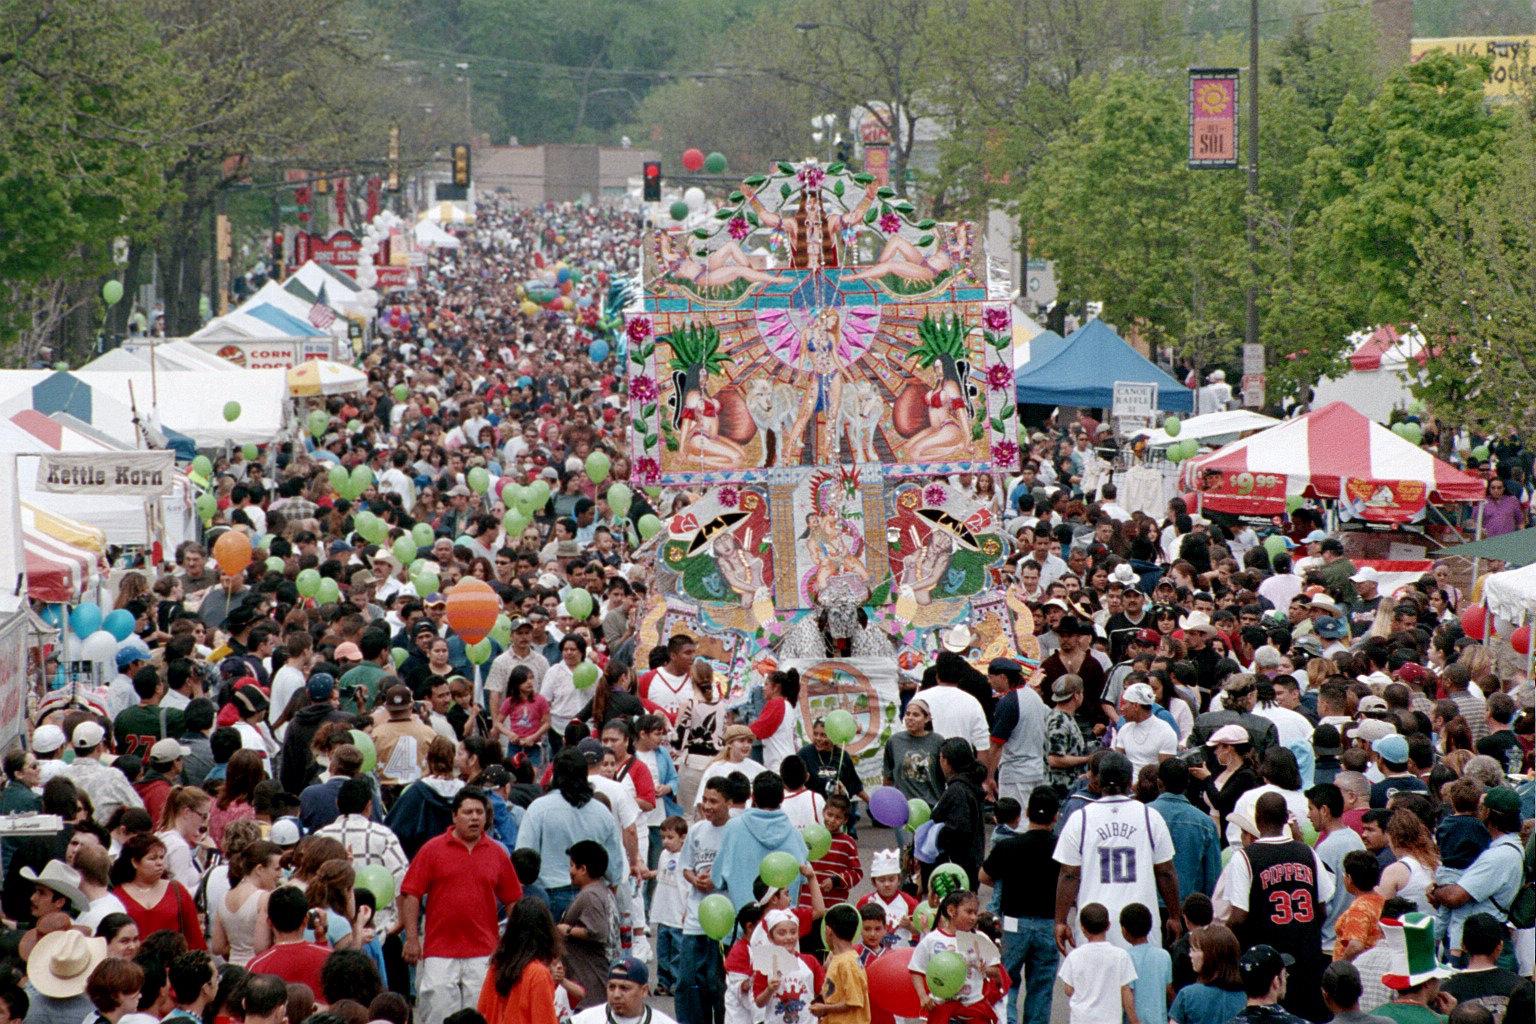 Day 35: Cinco de Mayo Fiesta - 365 Twin Cities